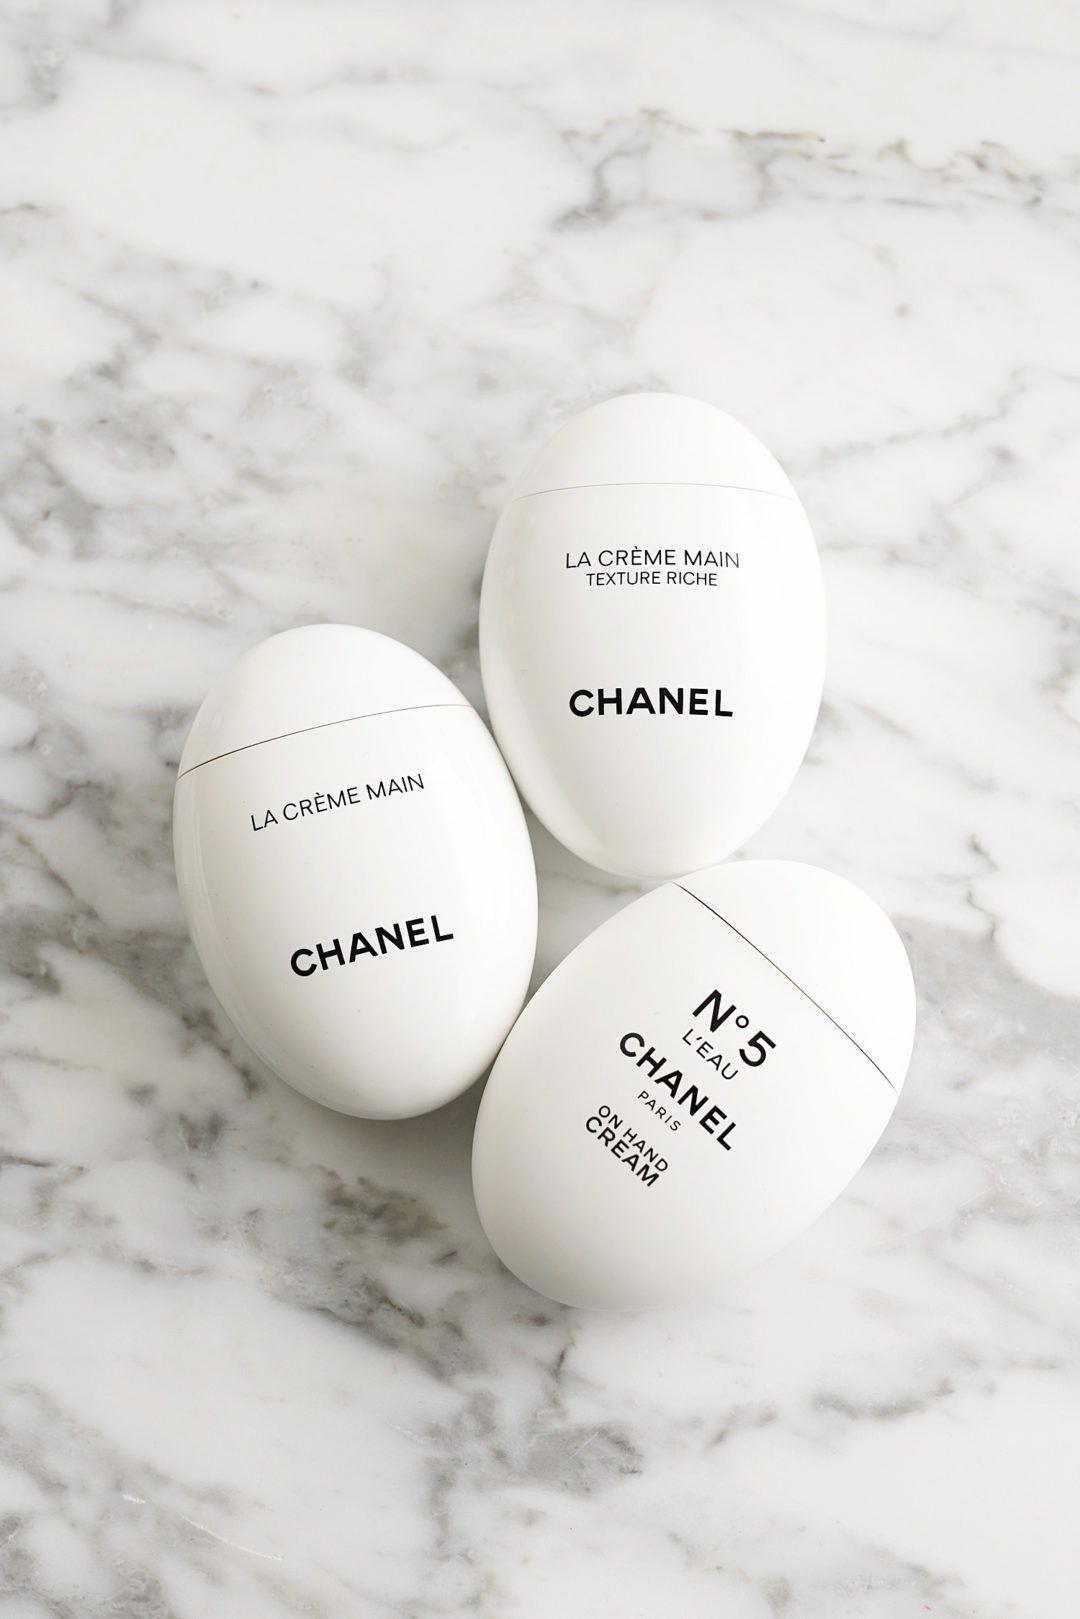 9abd450f Chanel Hand Cream Review, La Creme Main, No 5 Leau On Hand Cream and ...